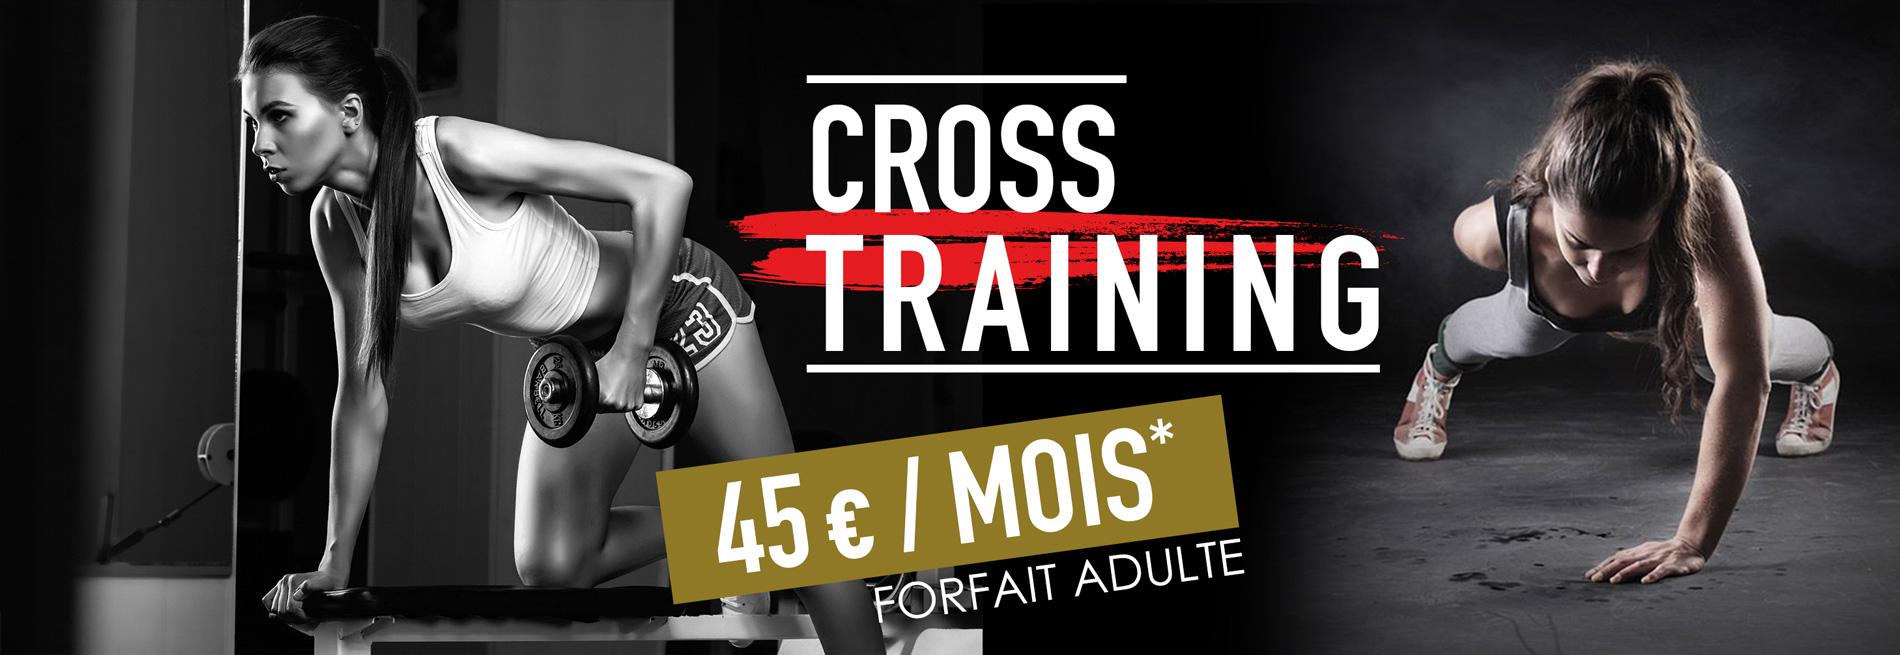 femme-crossfit-powertraininhcenter-cross-training-chalonsursaone